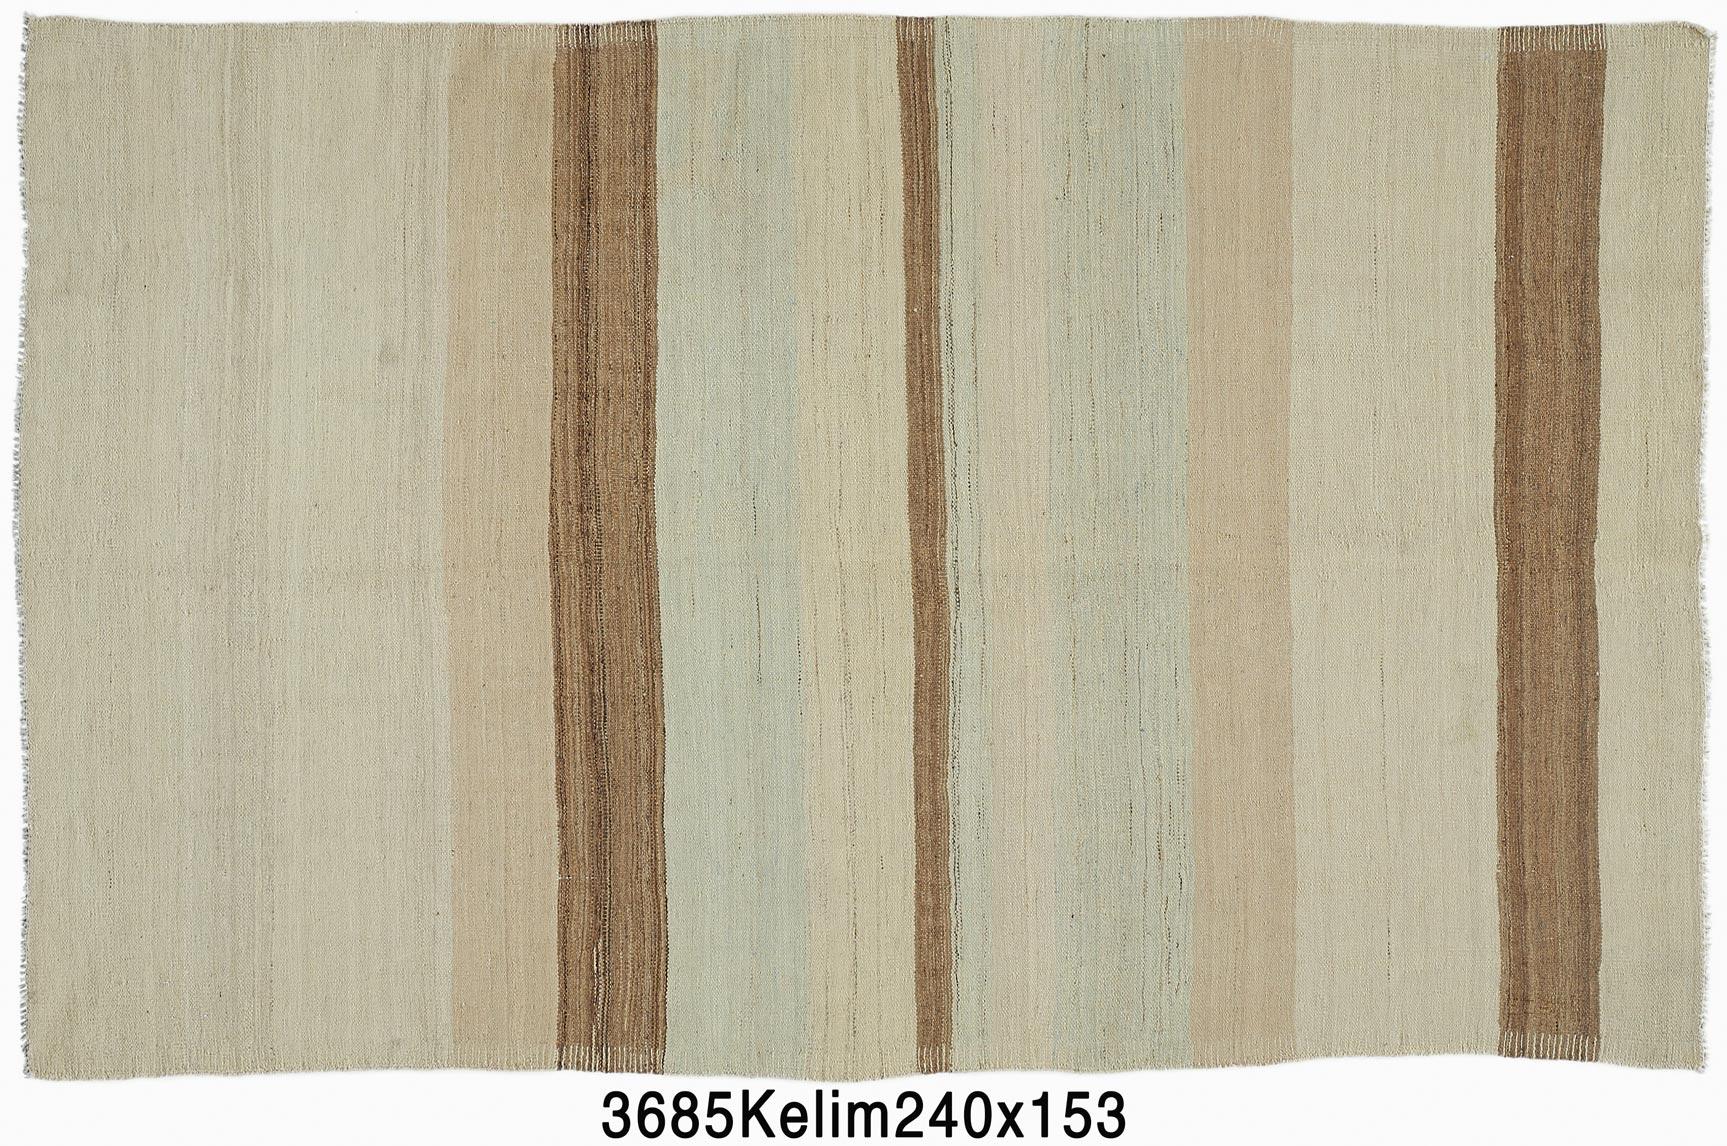 3685 kelim 240x153 ariana rugs. Black Bedroom Furniture Sets. Home Design Ideas